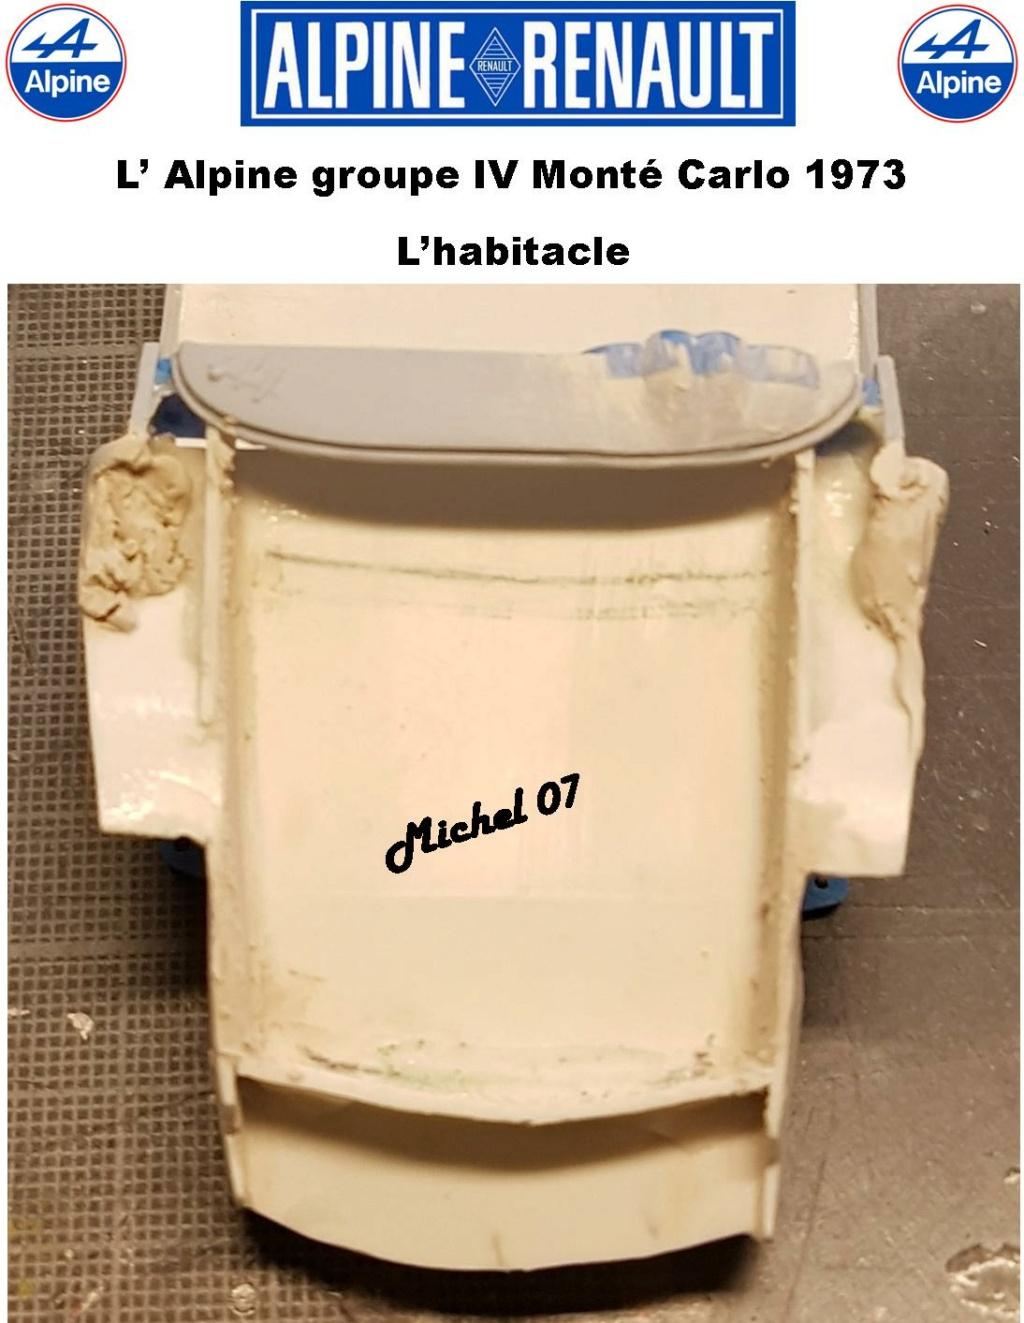 Fil rouge 2021 * Alpine A110 Groupe IV Monté Carlo 1973 1/24 Heller 80745 diorama assistance 21_210